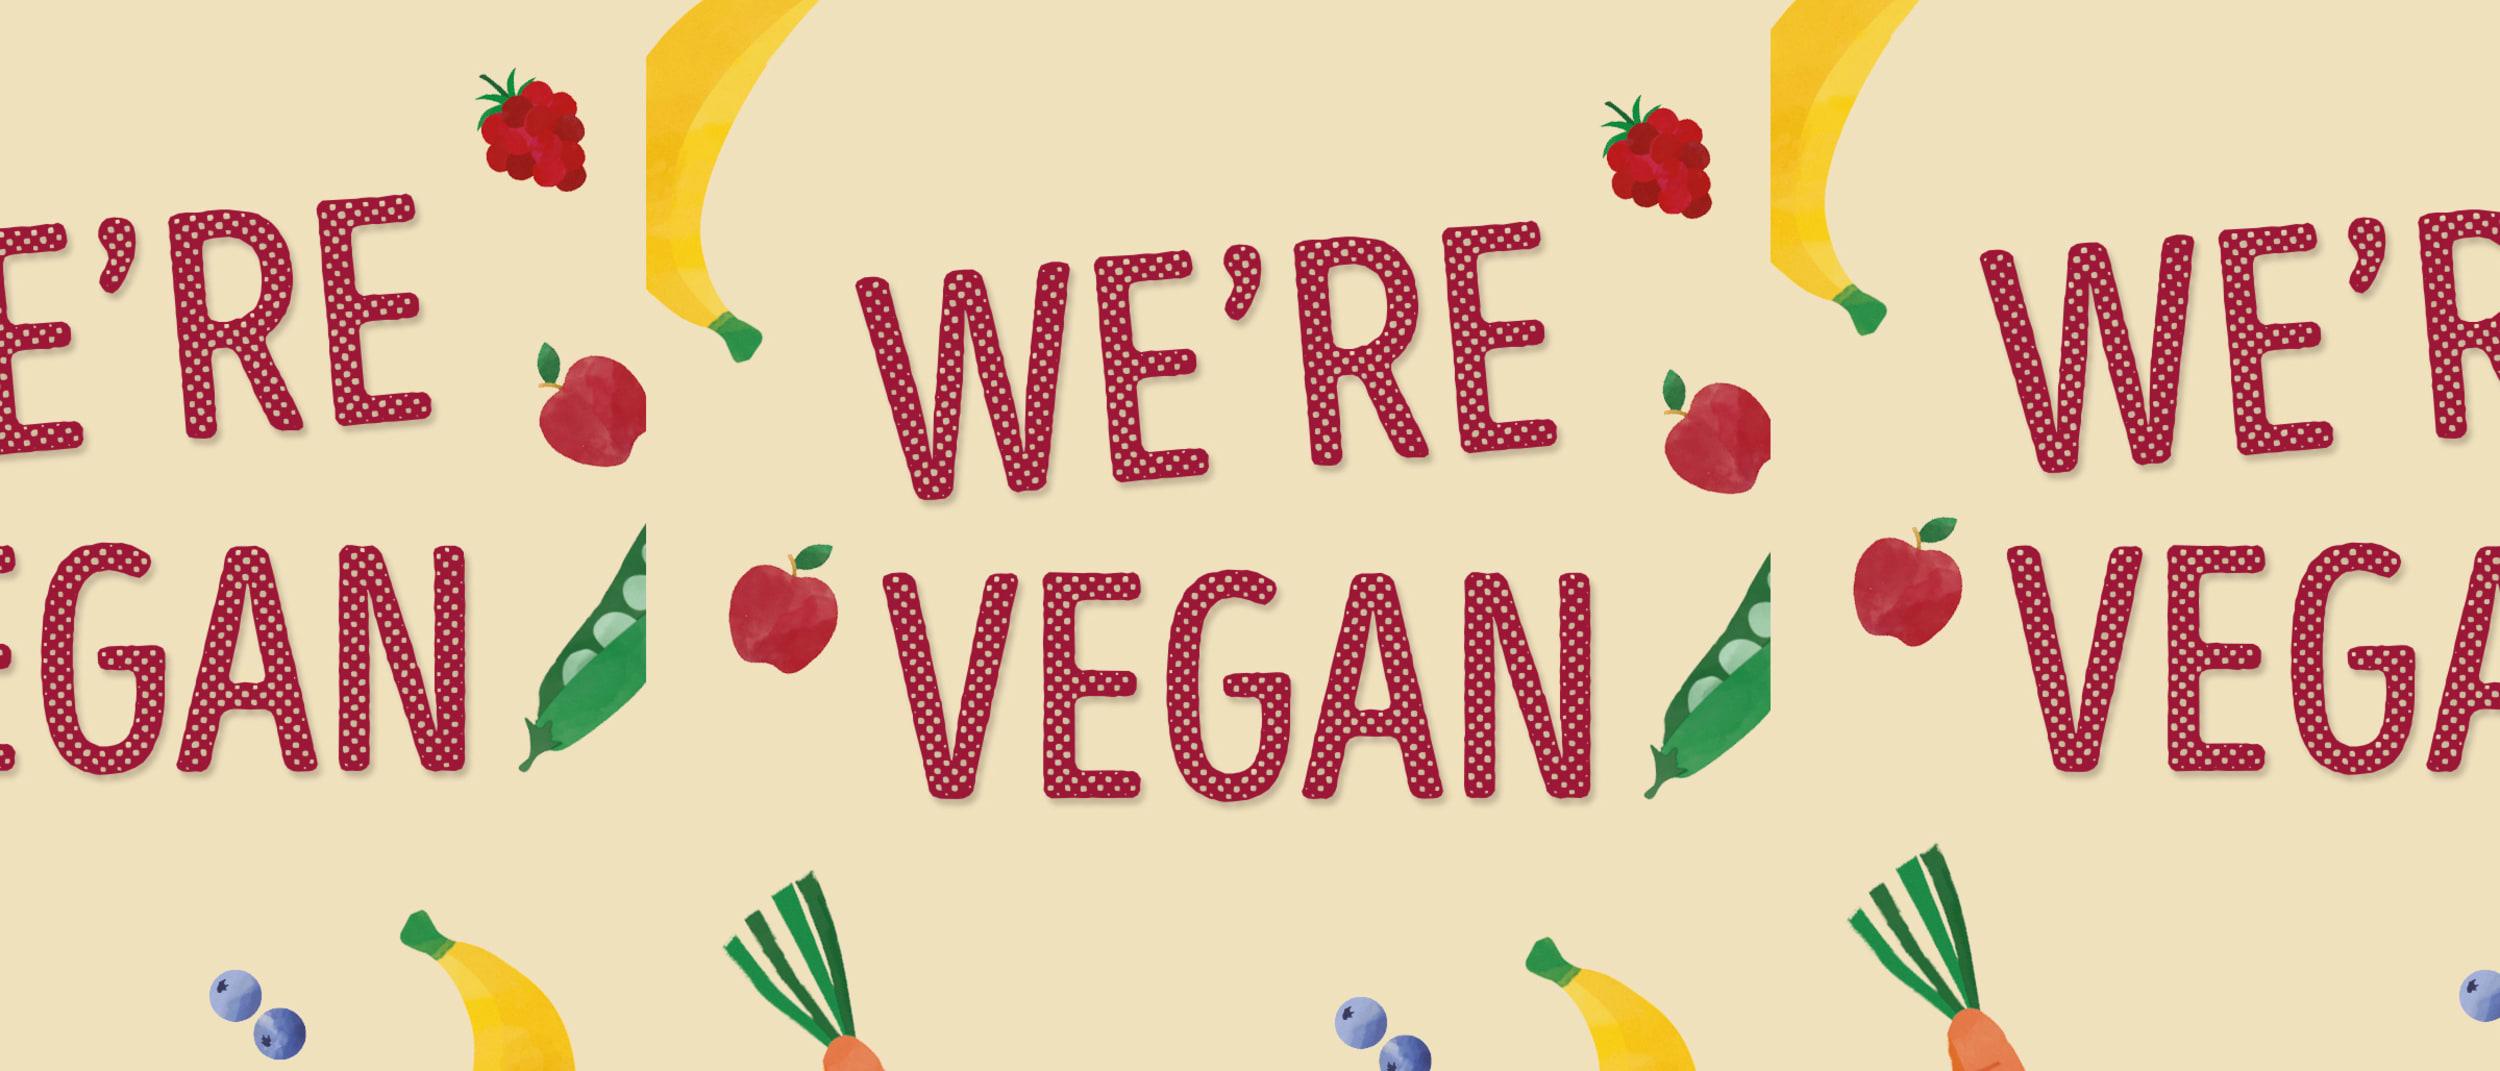 Muffin Break: We're going vegan